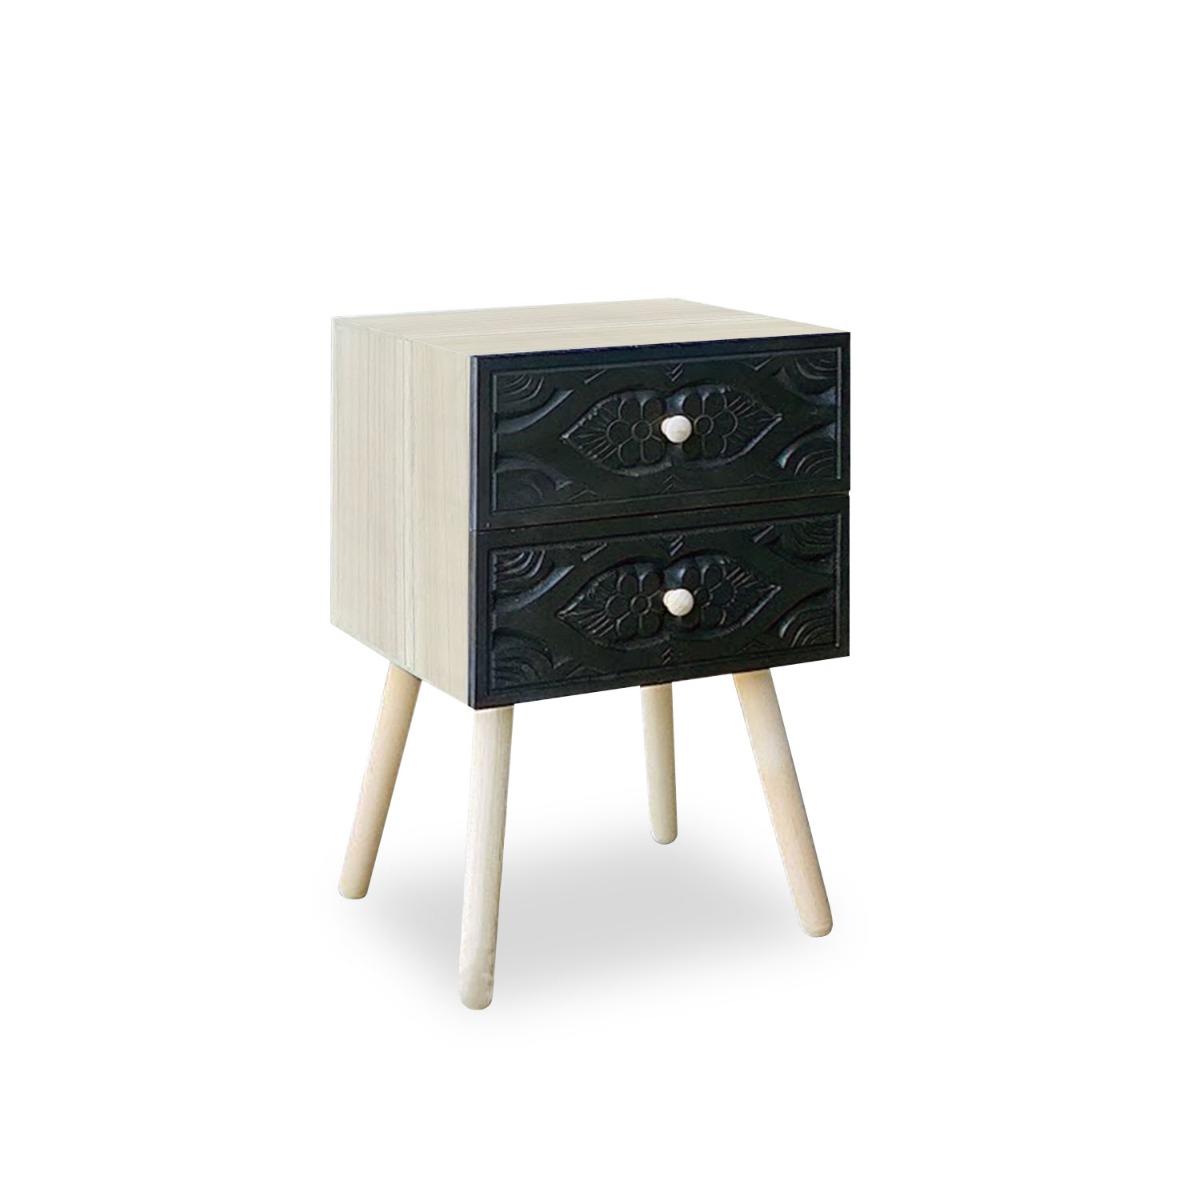 Table de chevet Catana 2 tiroirs Noir Carbone